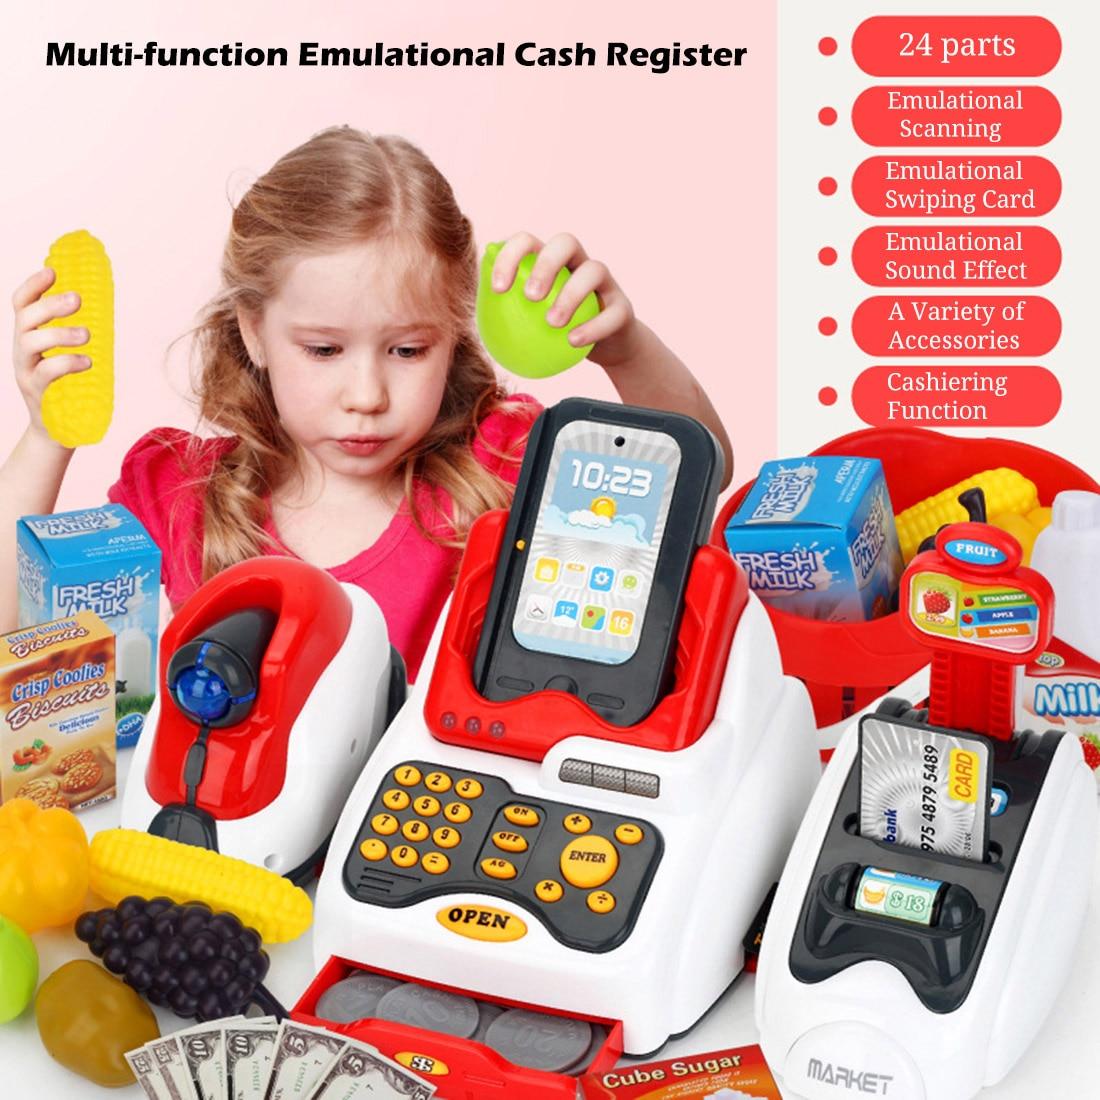 Rowsfire Lovely Children Pretend Play Toys Classic Supermarket Cash Register Toy for Children Cute Pattern Design цена